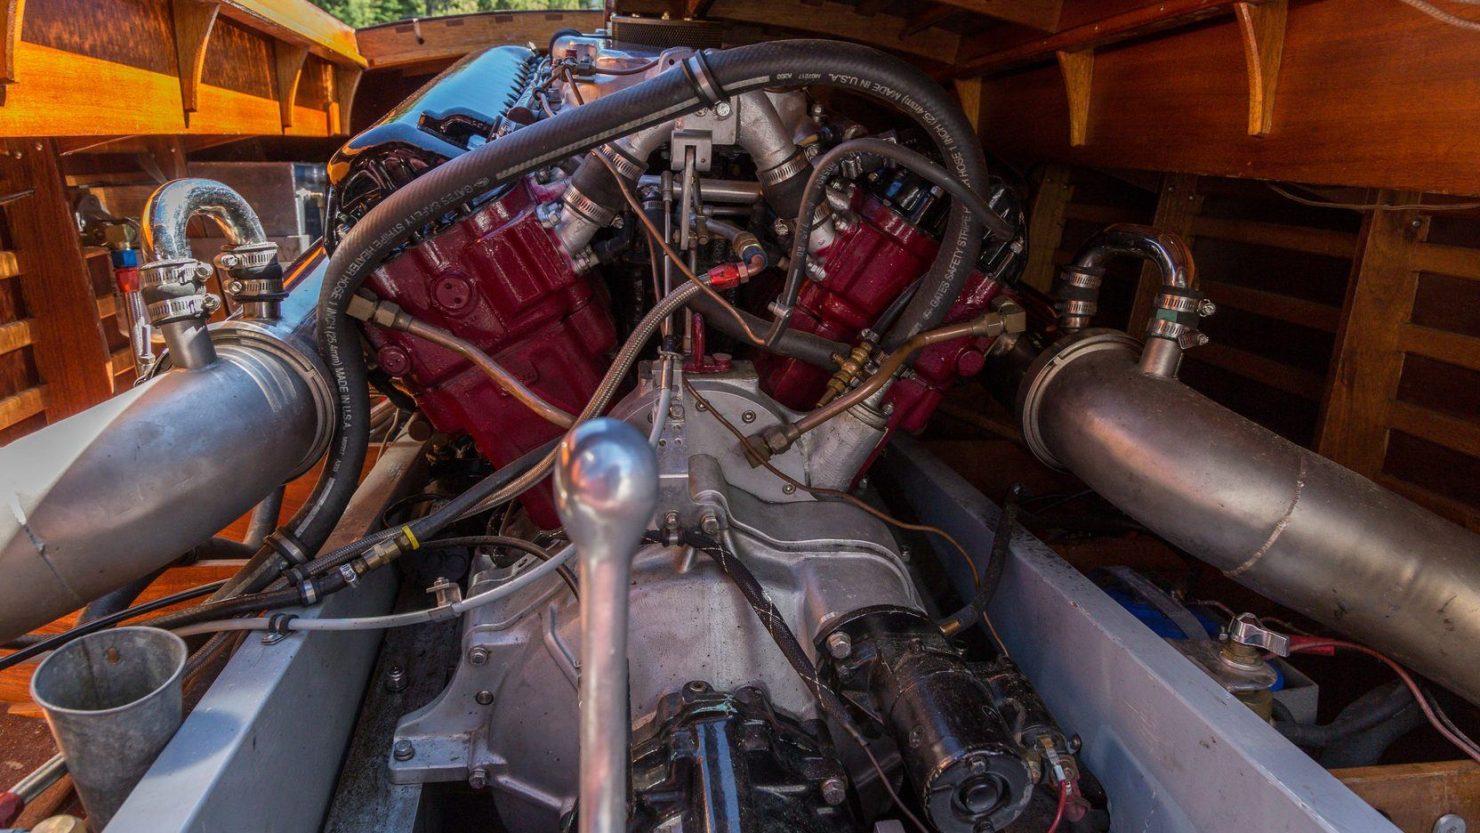 mahogany speed boat 12 1480x833 - 27 Liter V12 Brown & Bassett Gentleman's Racer